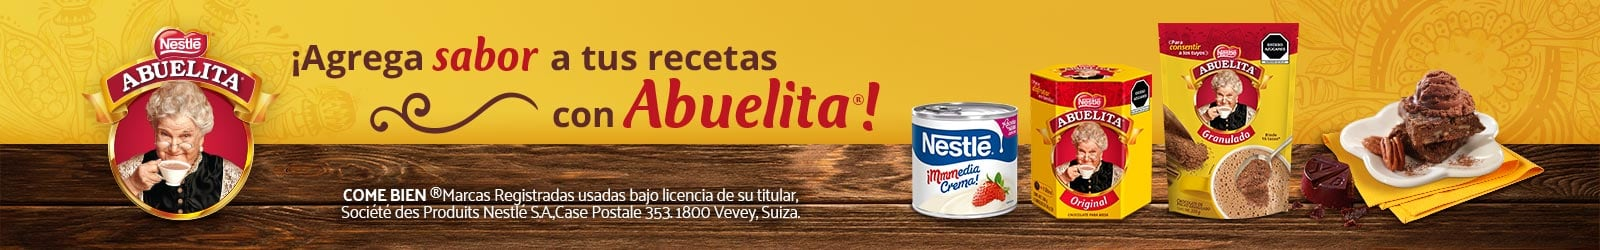 Nestle Abuelita